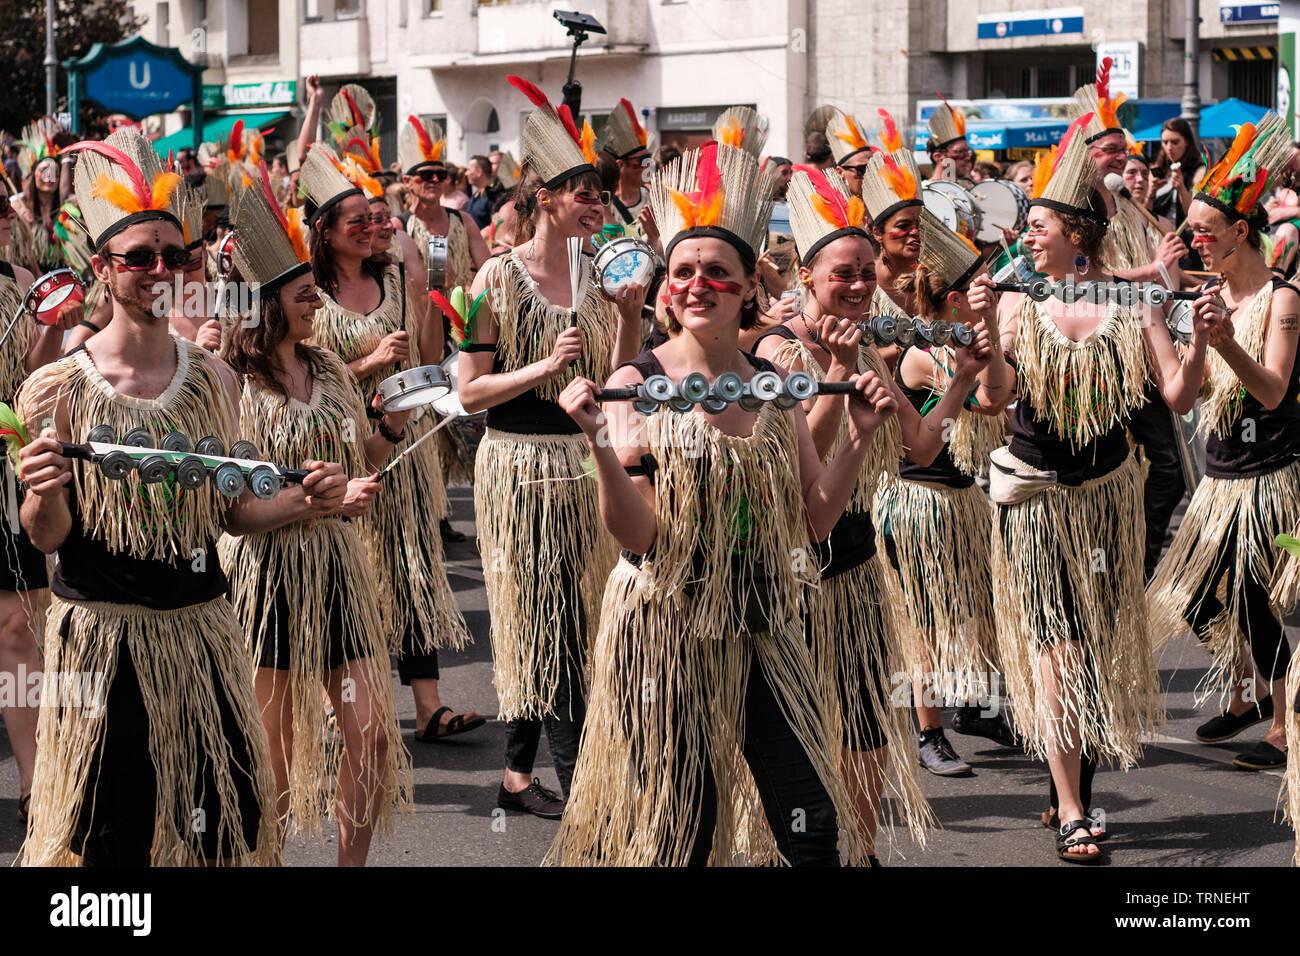 Berlin, Germany - june 2019: People performing at Karneval der Kulturen (Carnival of Cultures) in Berlin - Stock Image